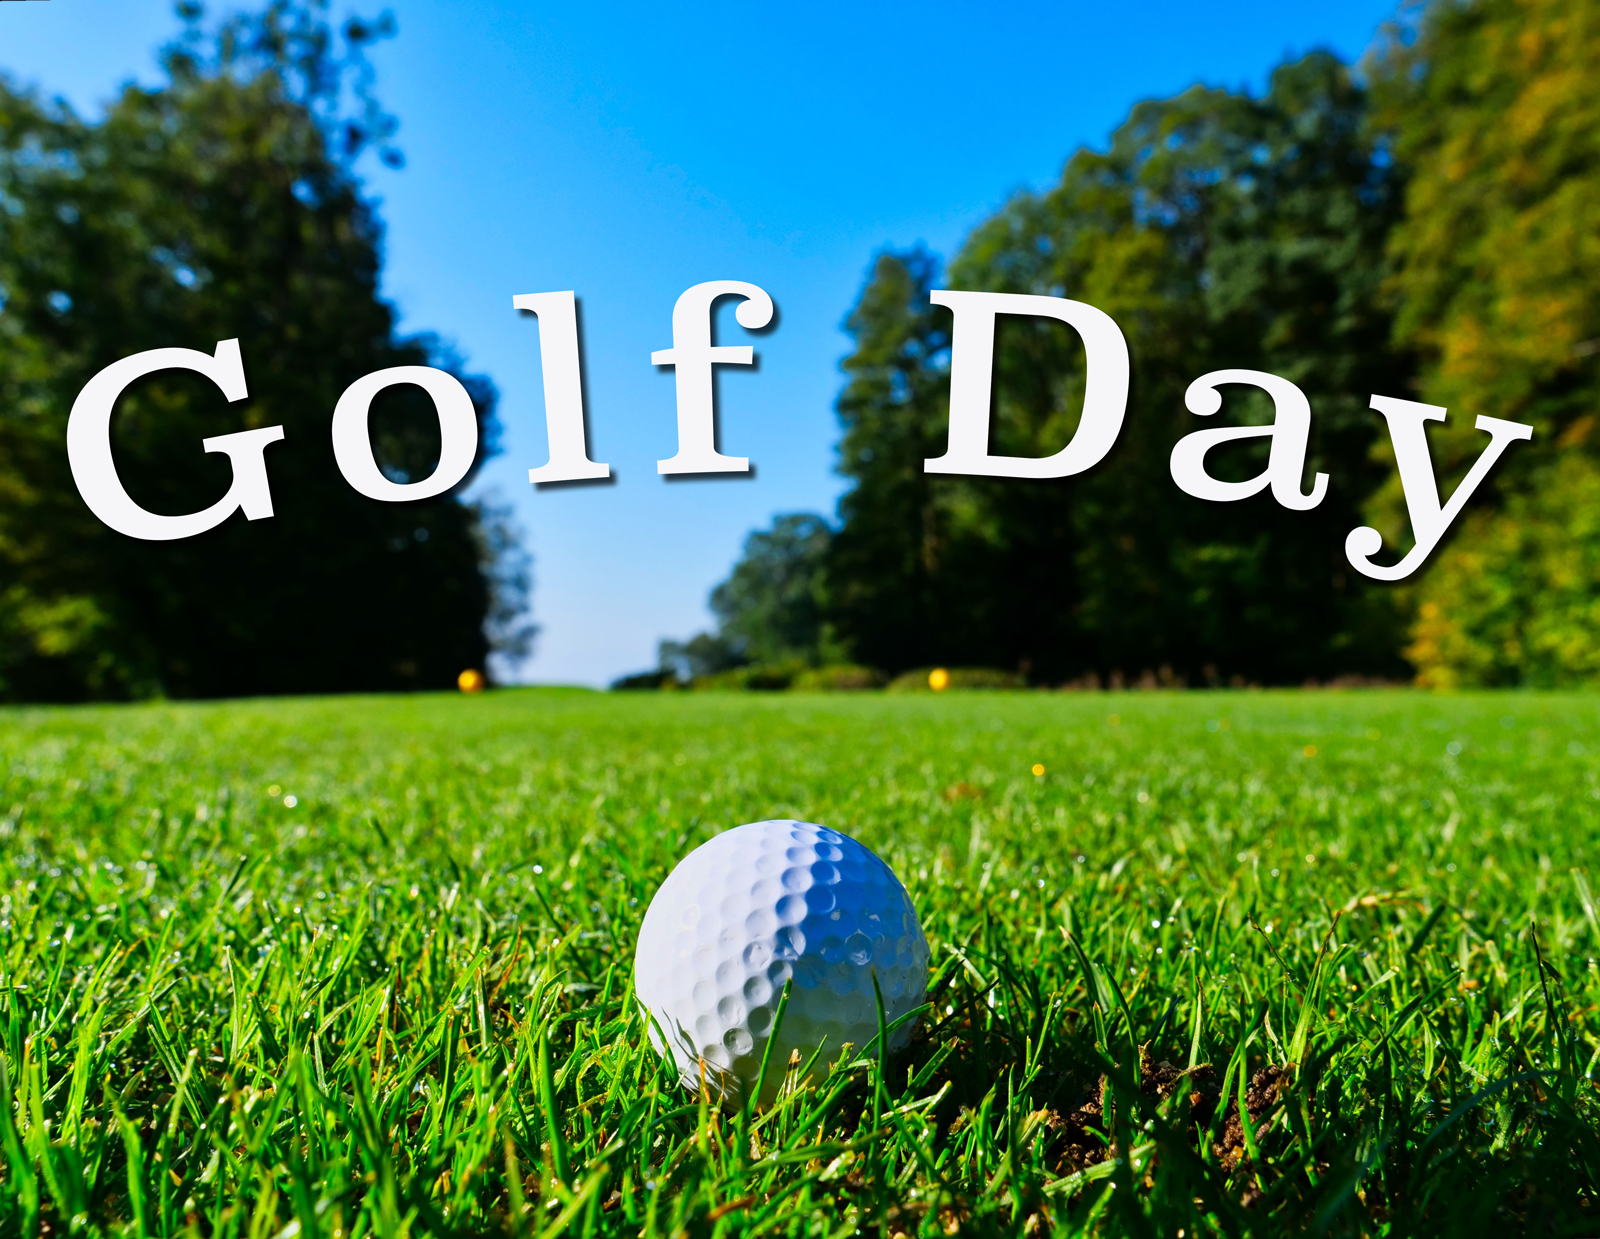 GolfDay.png